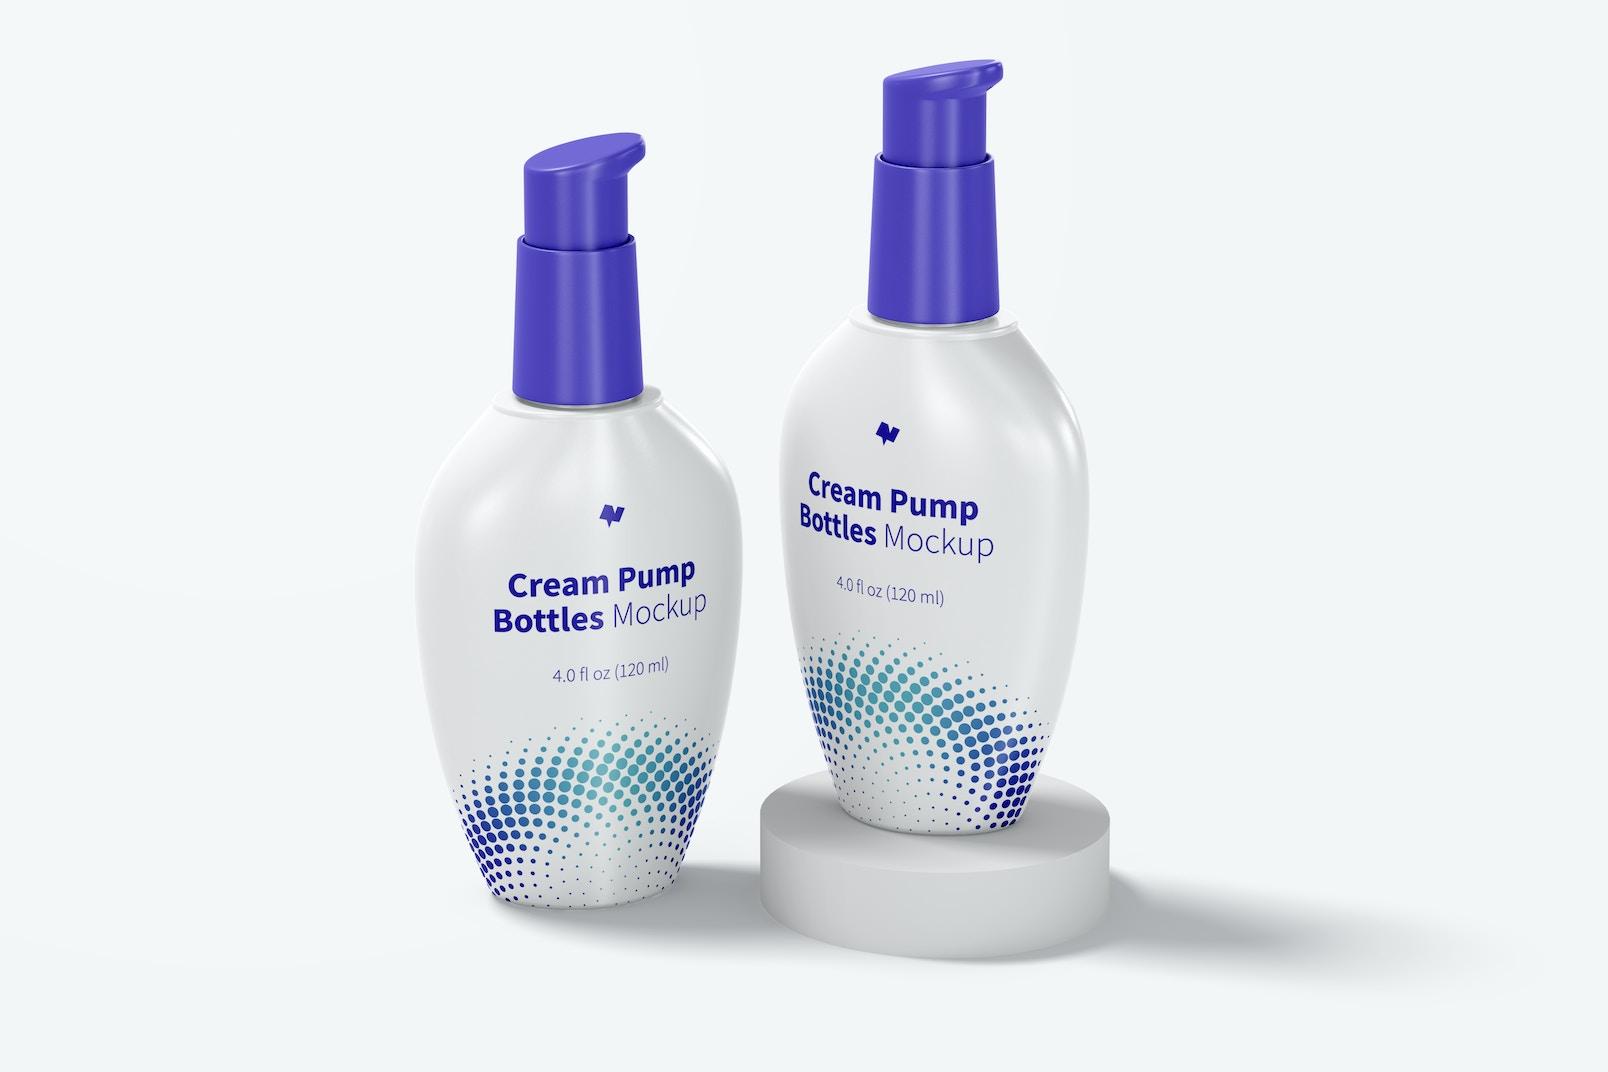 Cream Pump Bottles Mockup